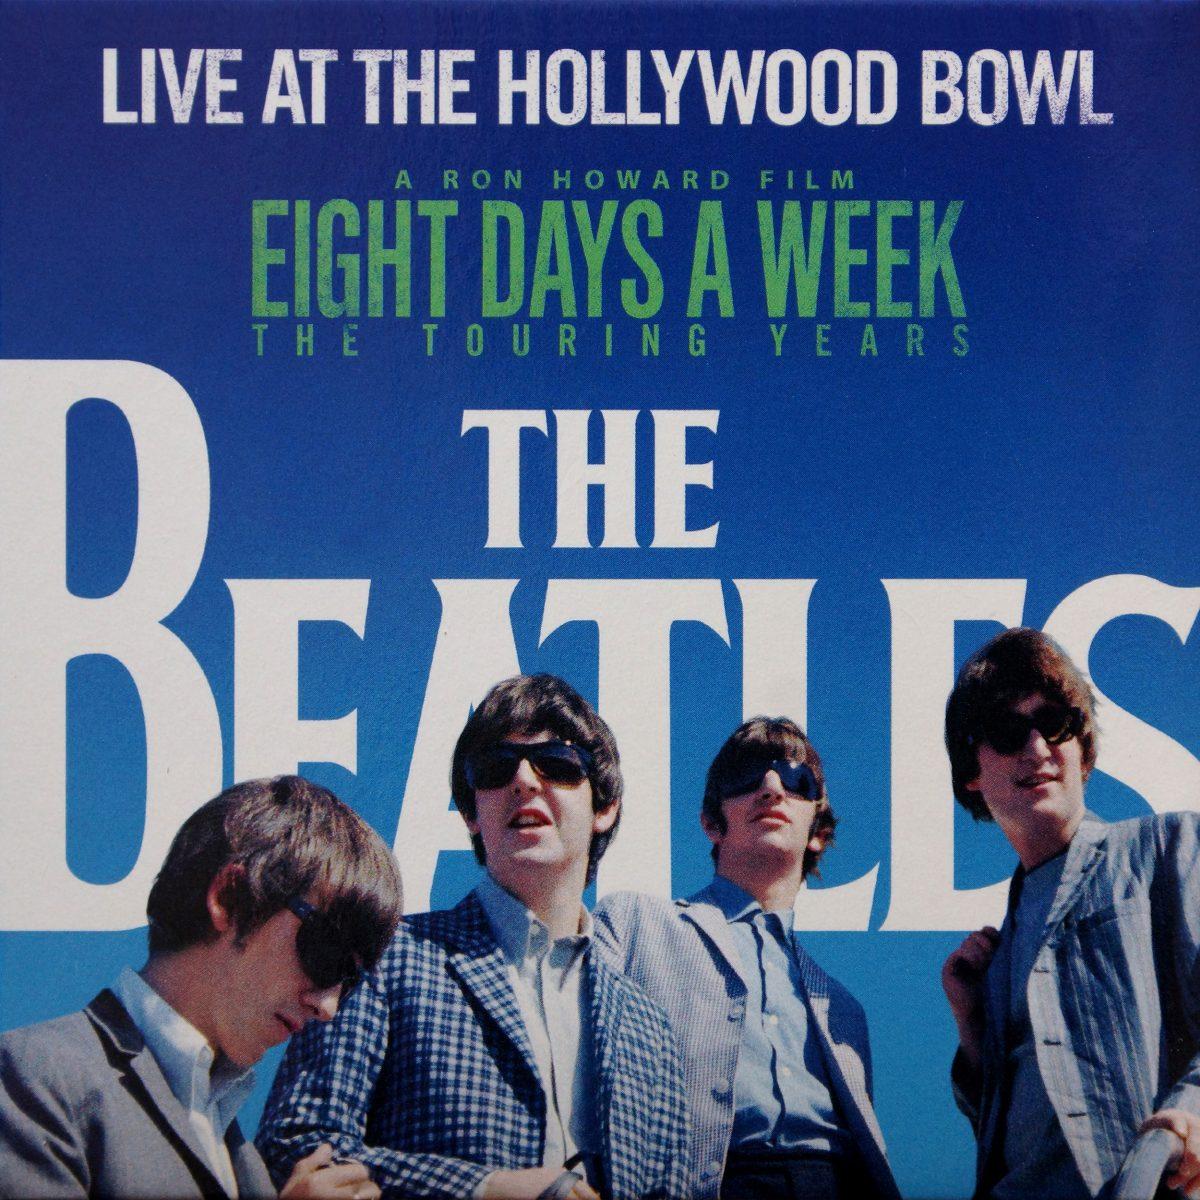 Beatles: Live At The Hollywood Bowl (1977)